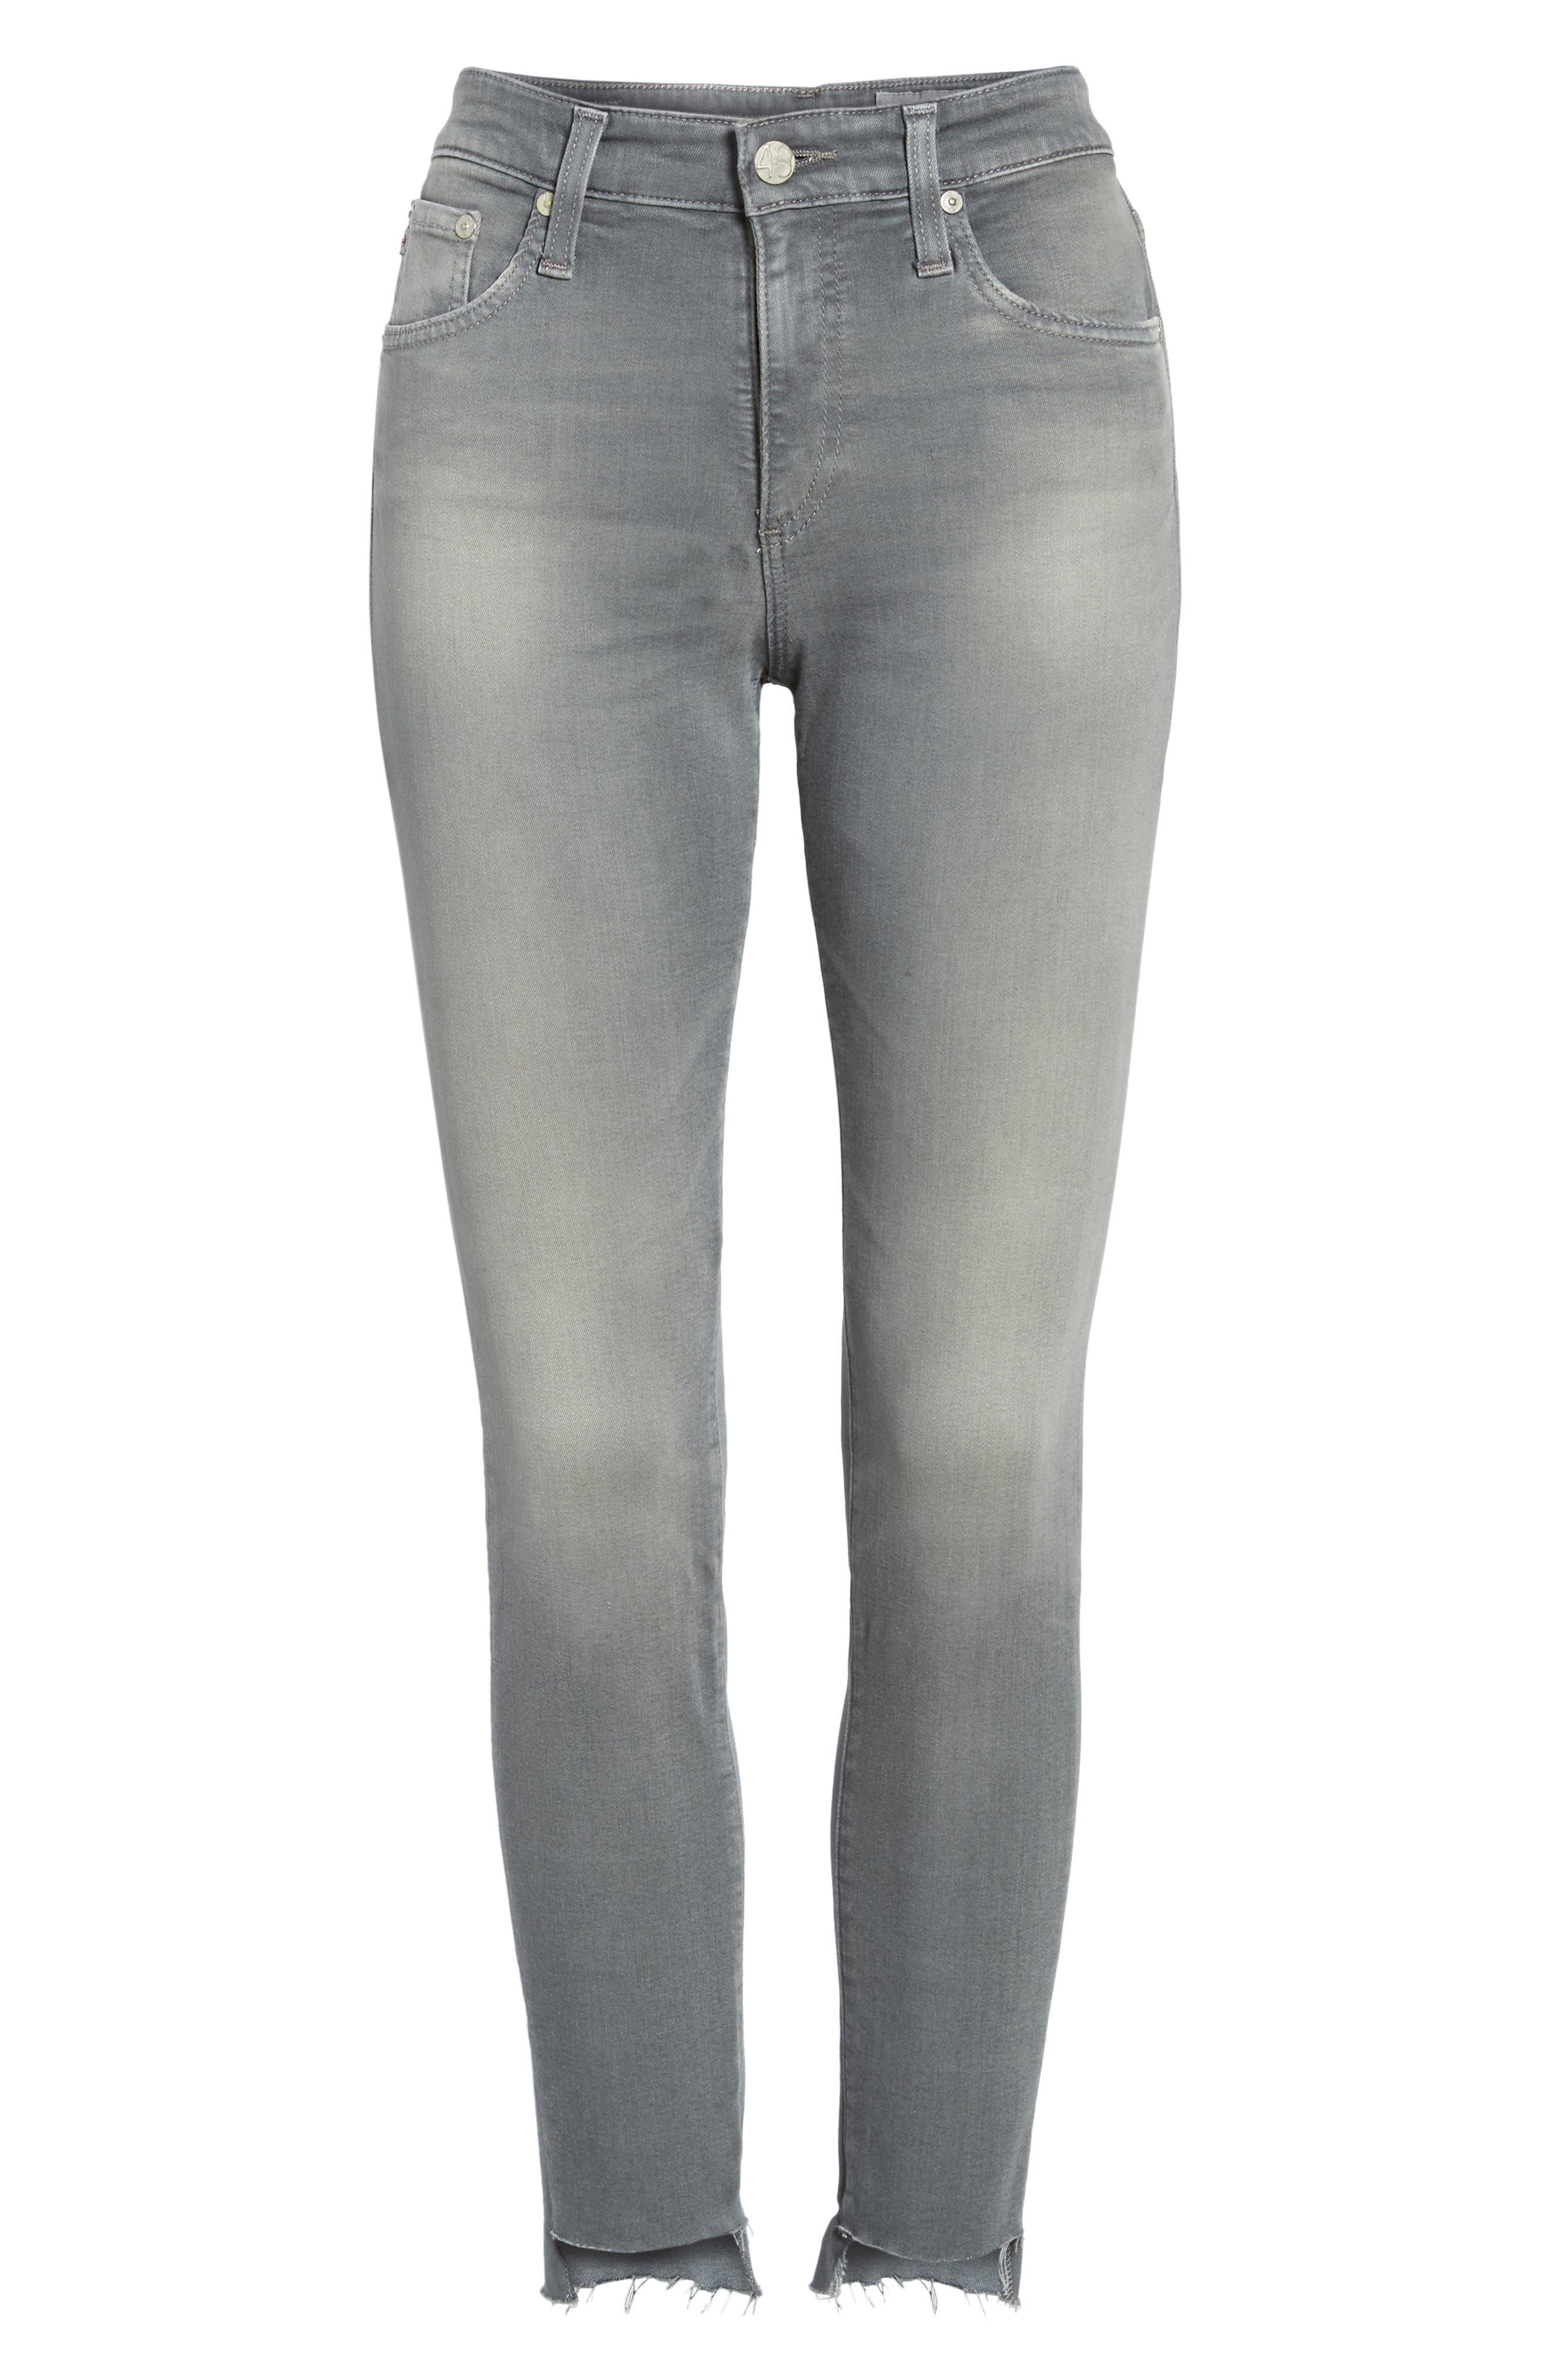 Farrah High Waist Ankle Skinny Jeans,                             Alternate thumbnail 6, color,                             10 Years Grey Shadow